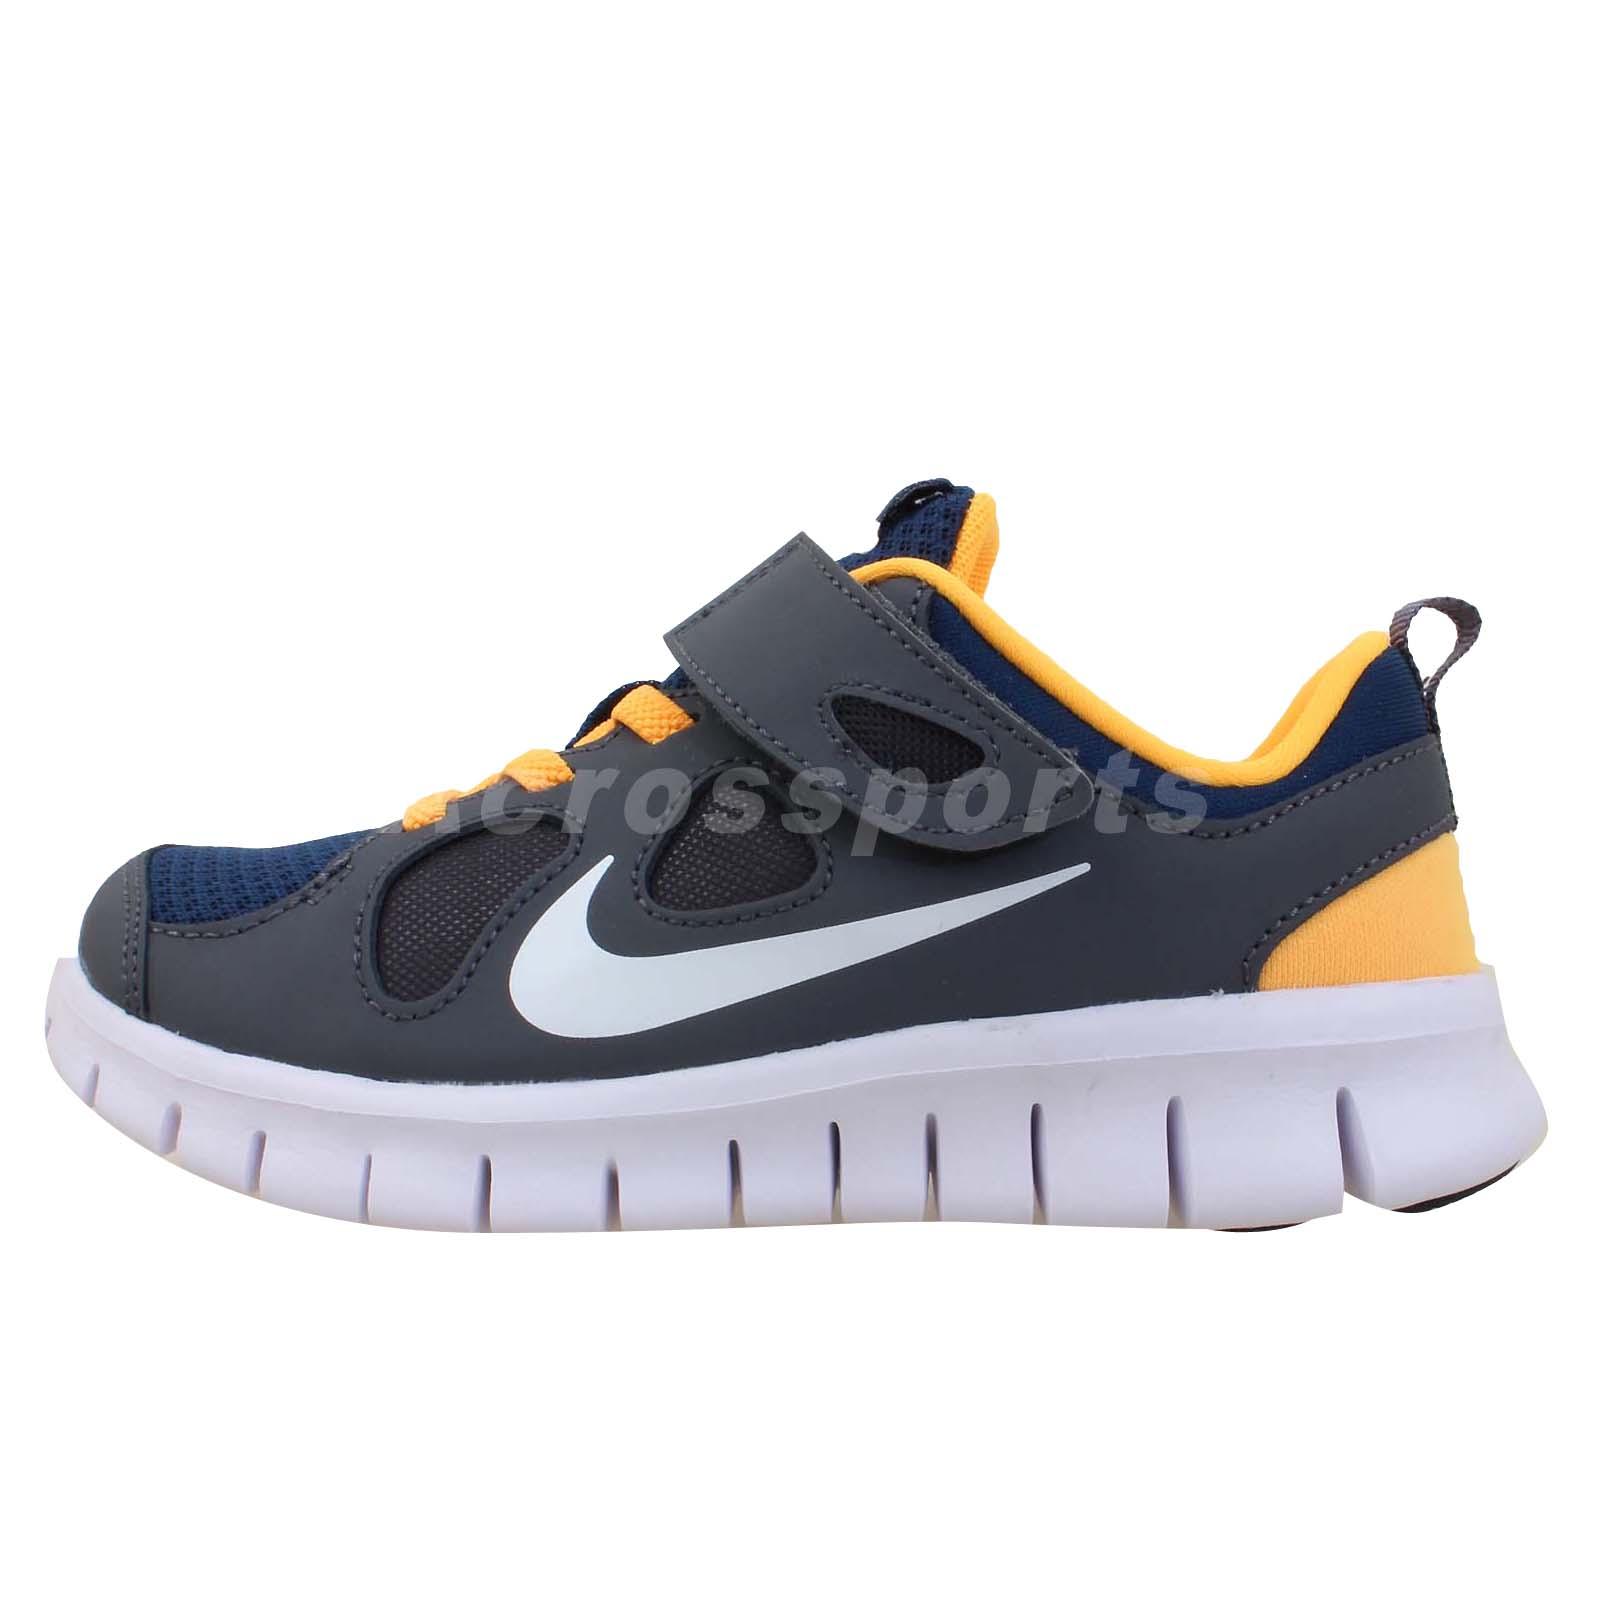 Nike Boy Shoes Amazon